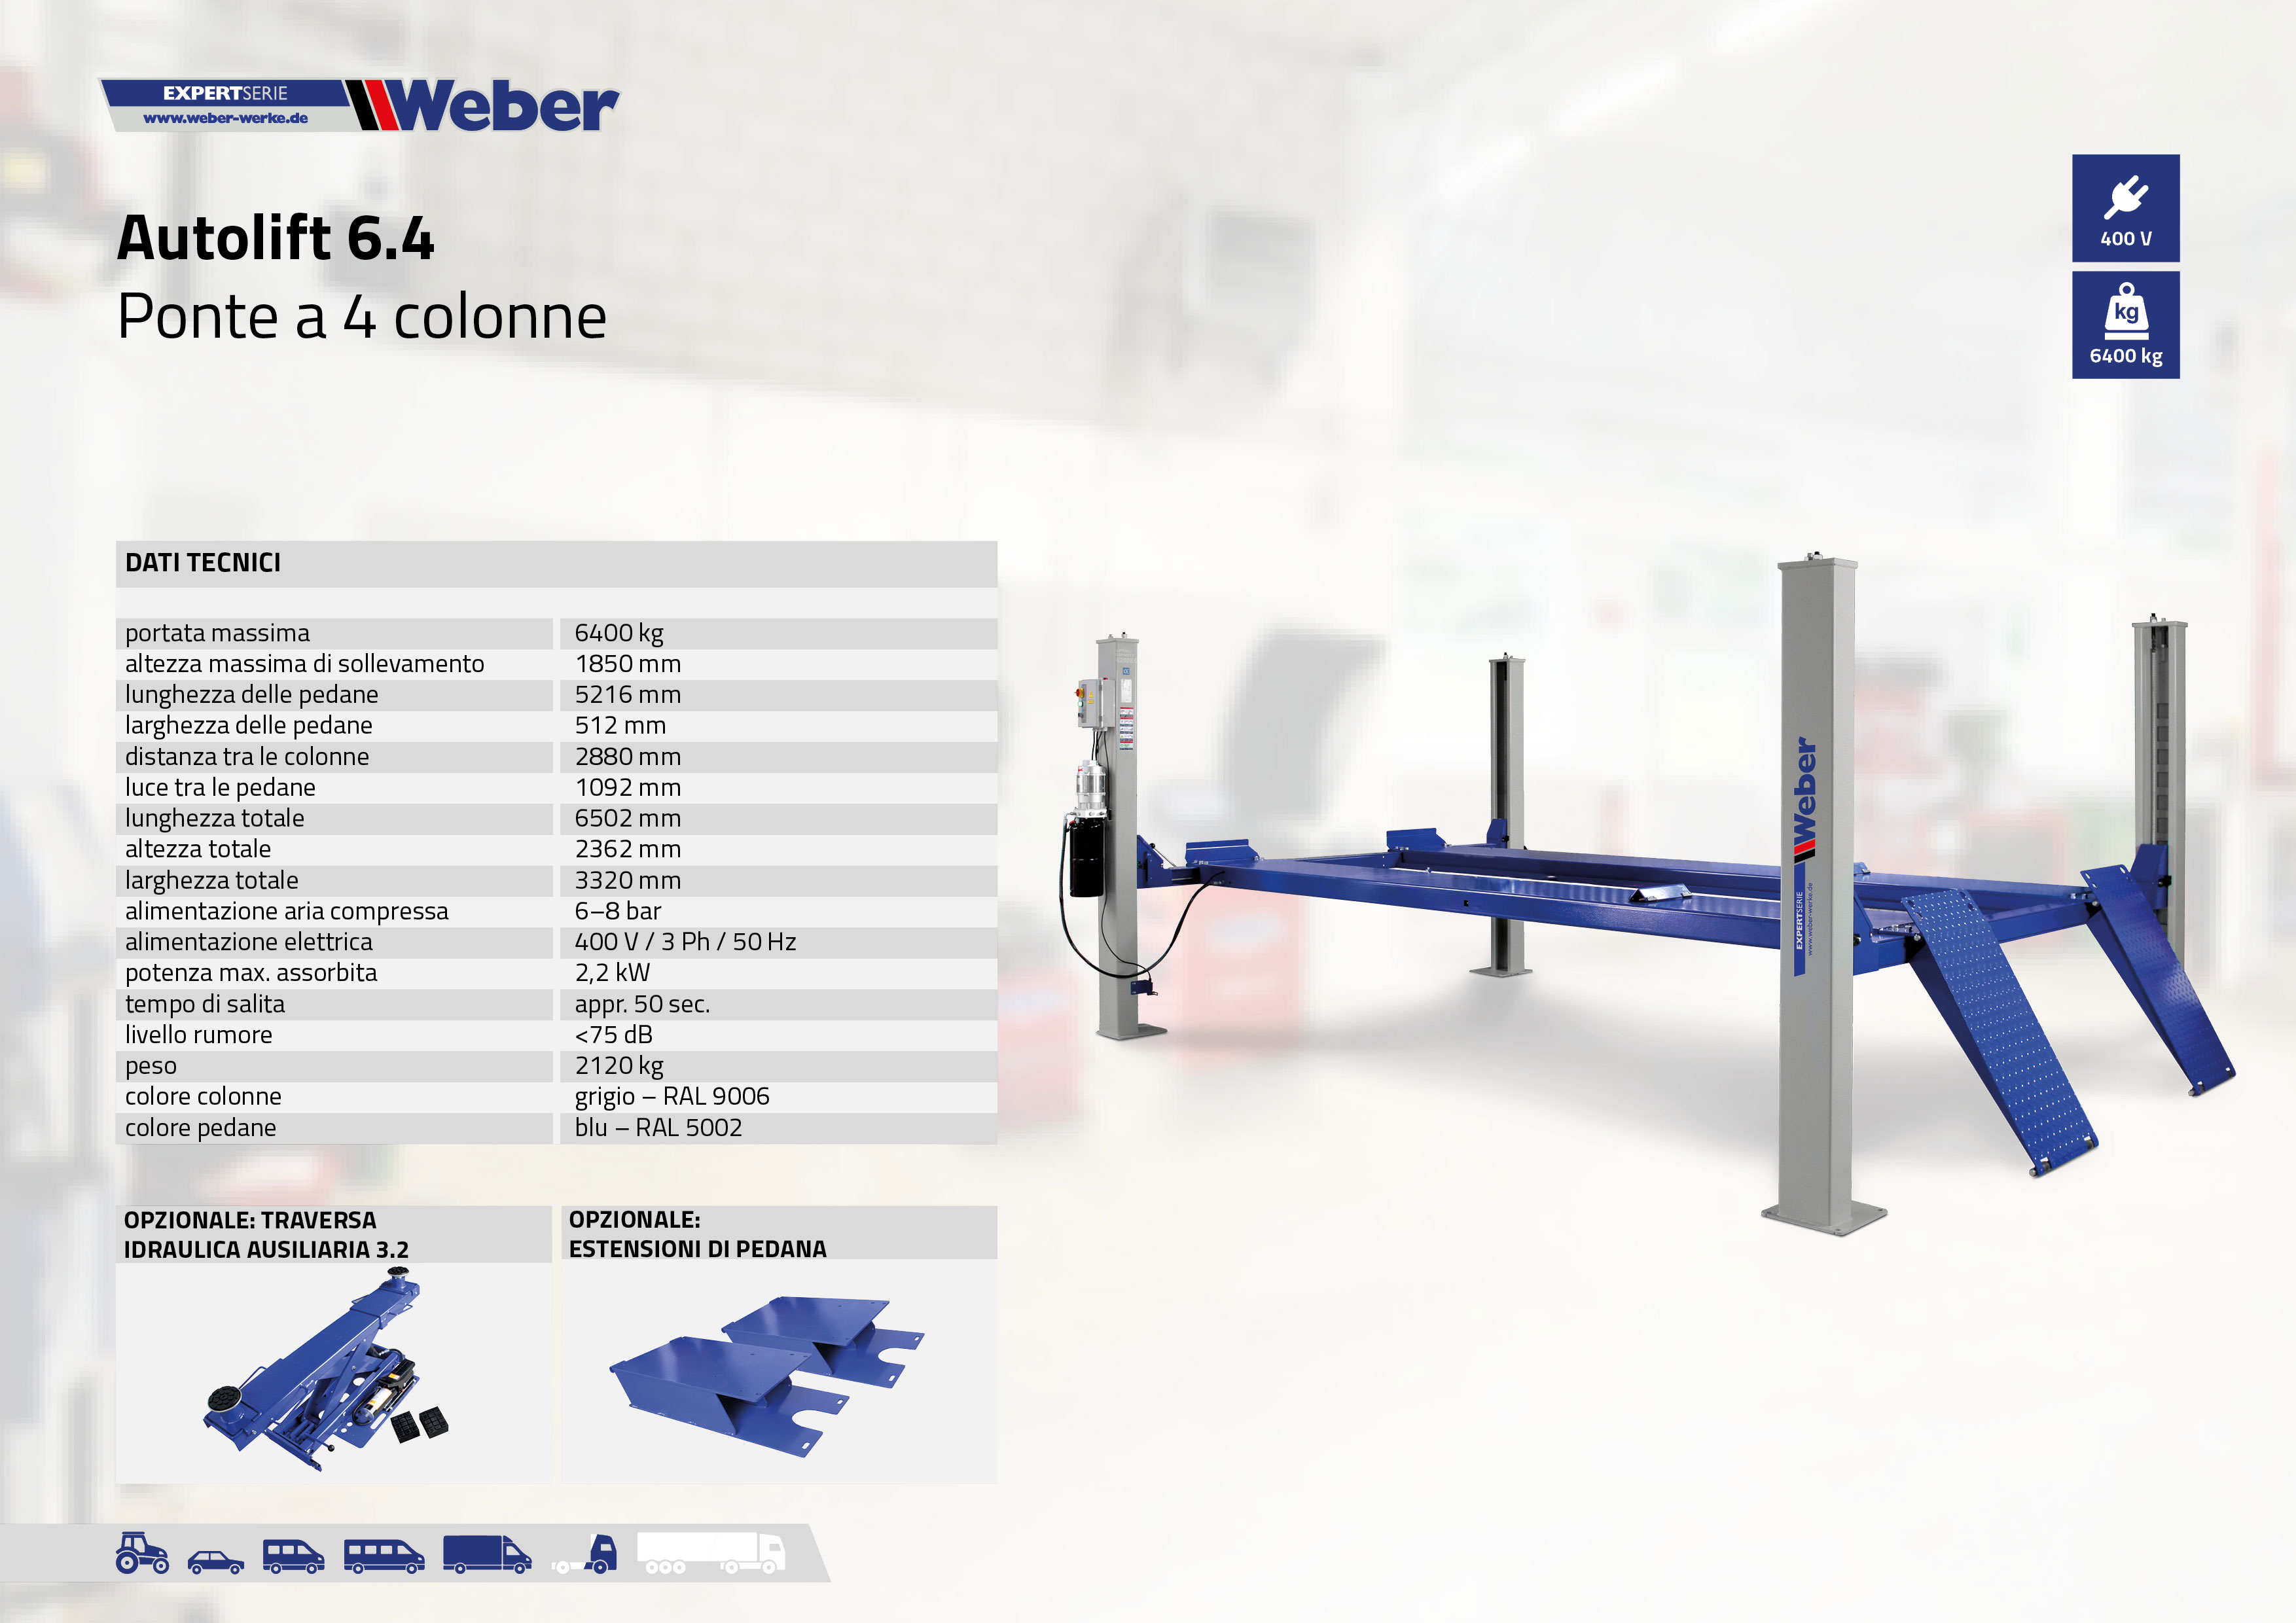 Ponte sollevatore a 4 colonne Weber Expert Serie Autolift 6.4